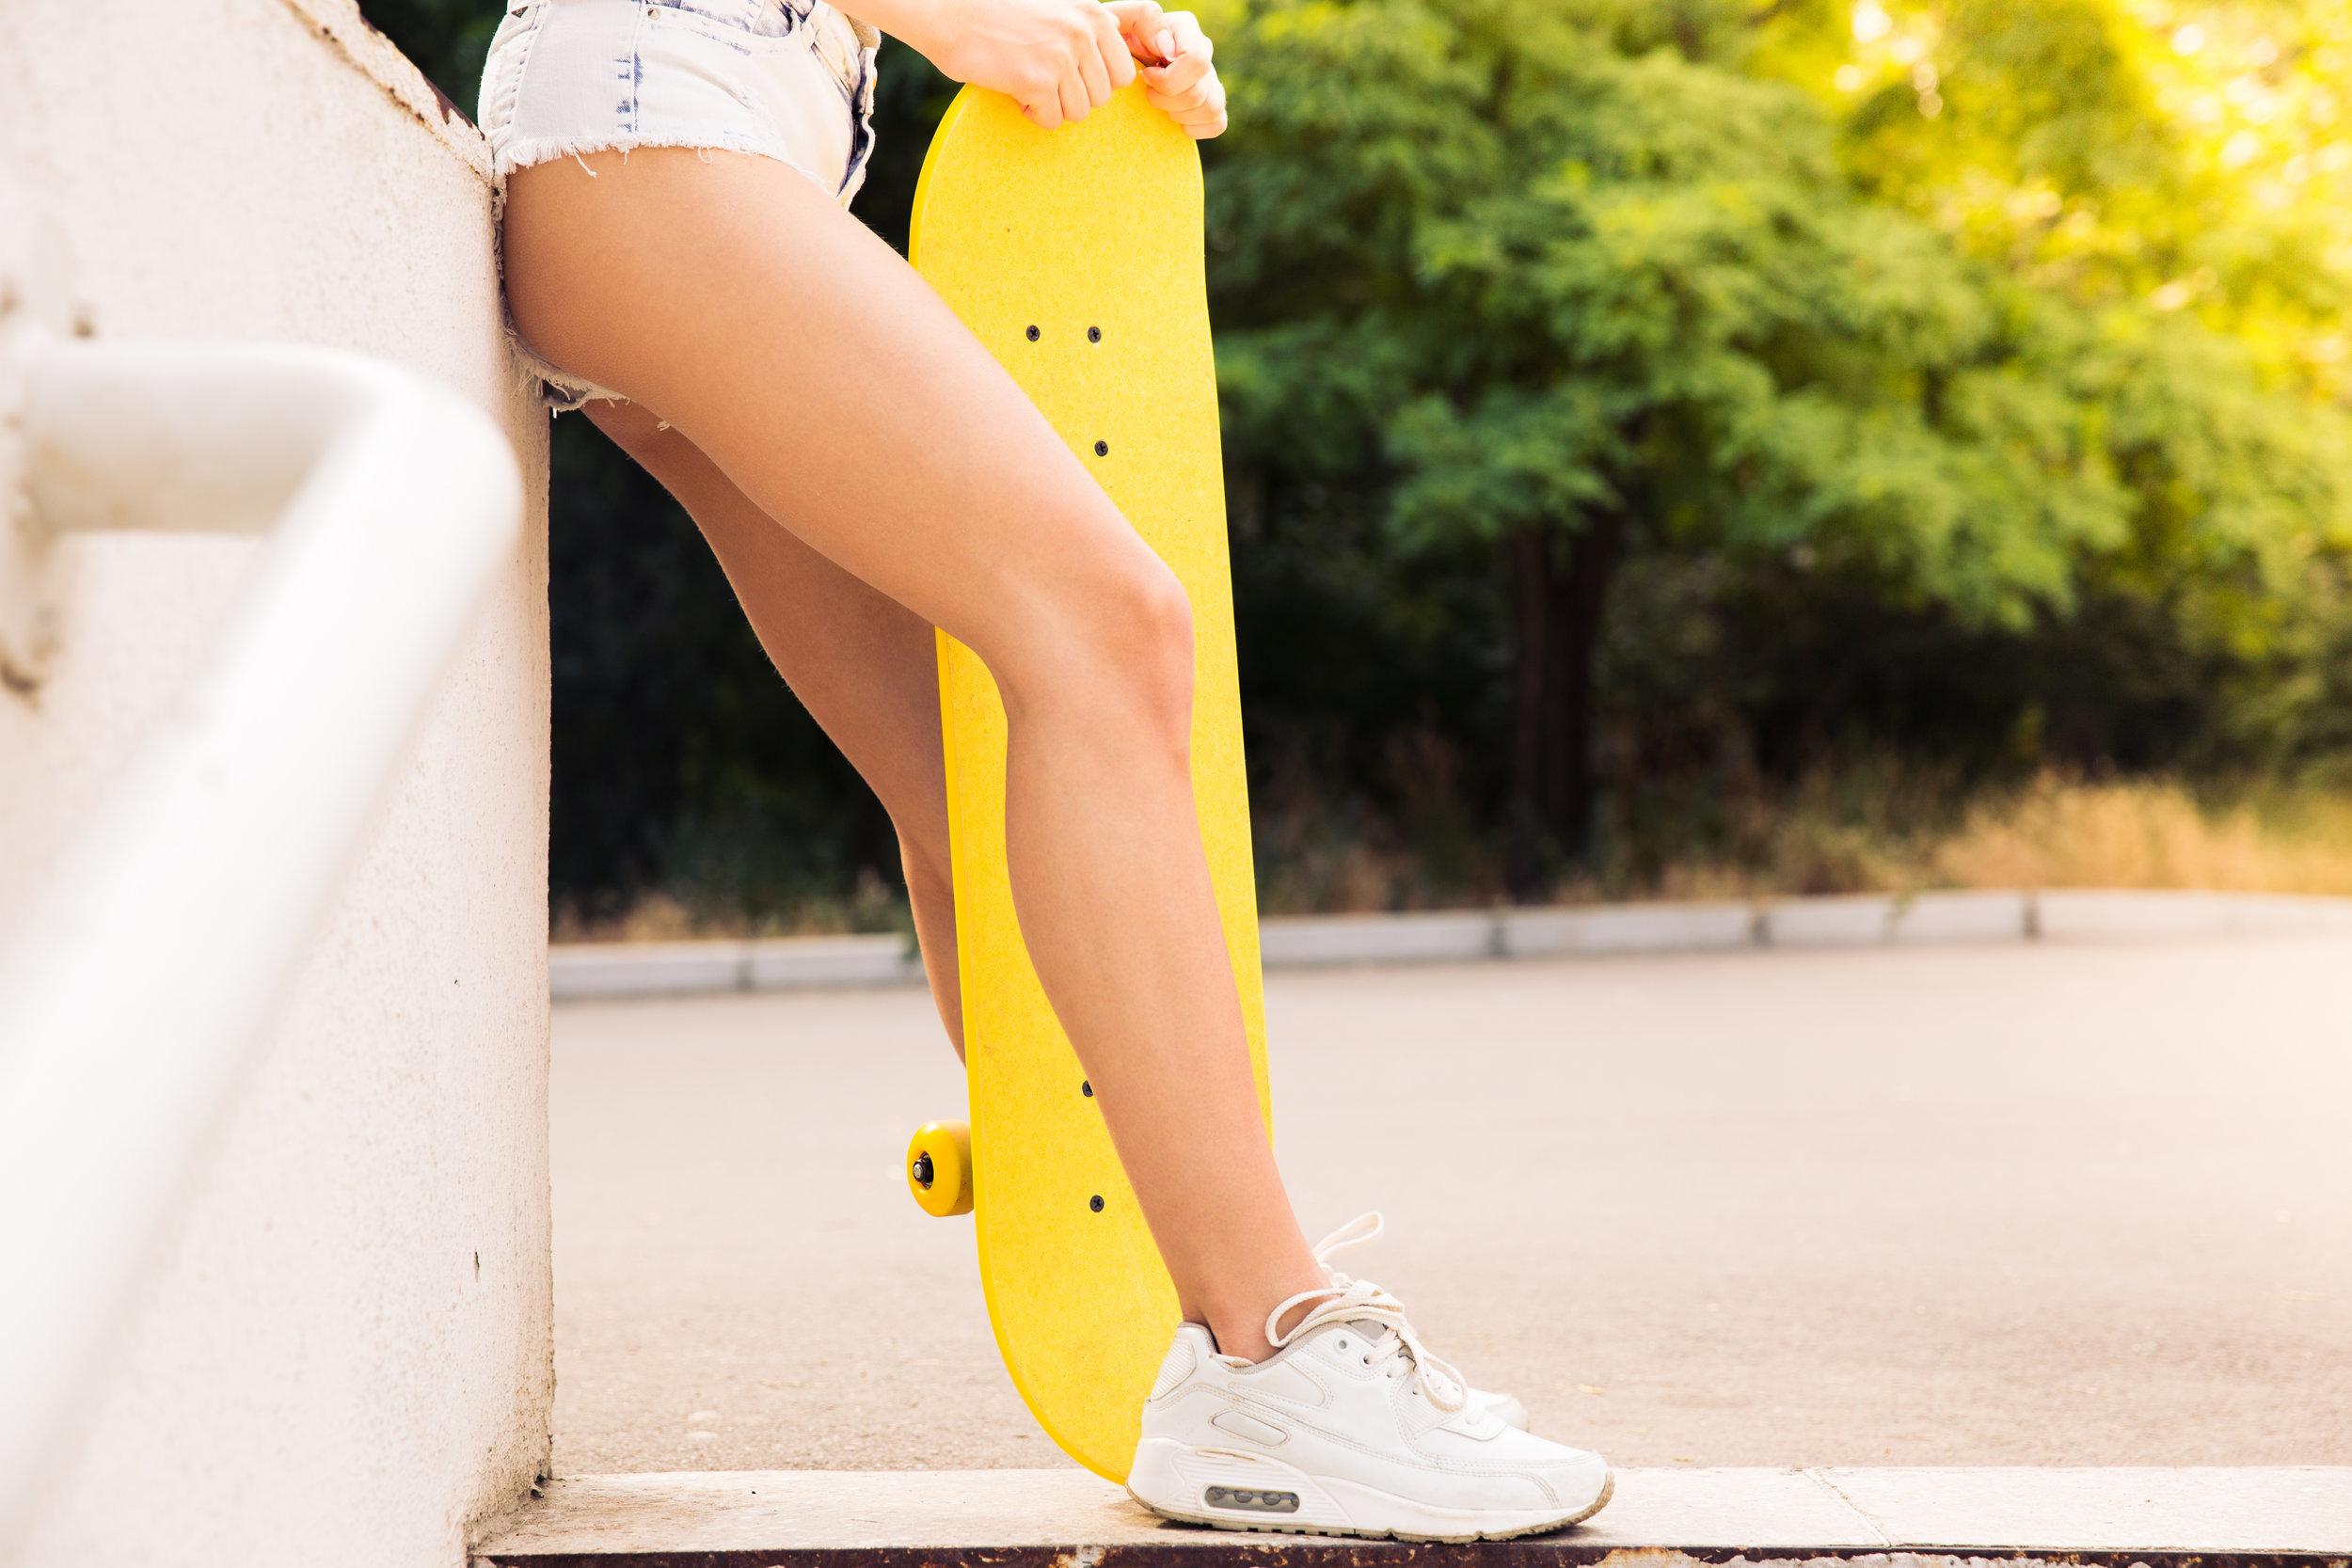 closeup-portrait-of-female-legs-with-skateboard_rtNgrroTrs.jpg